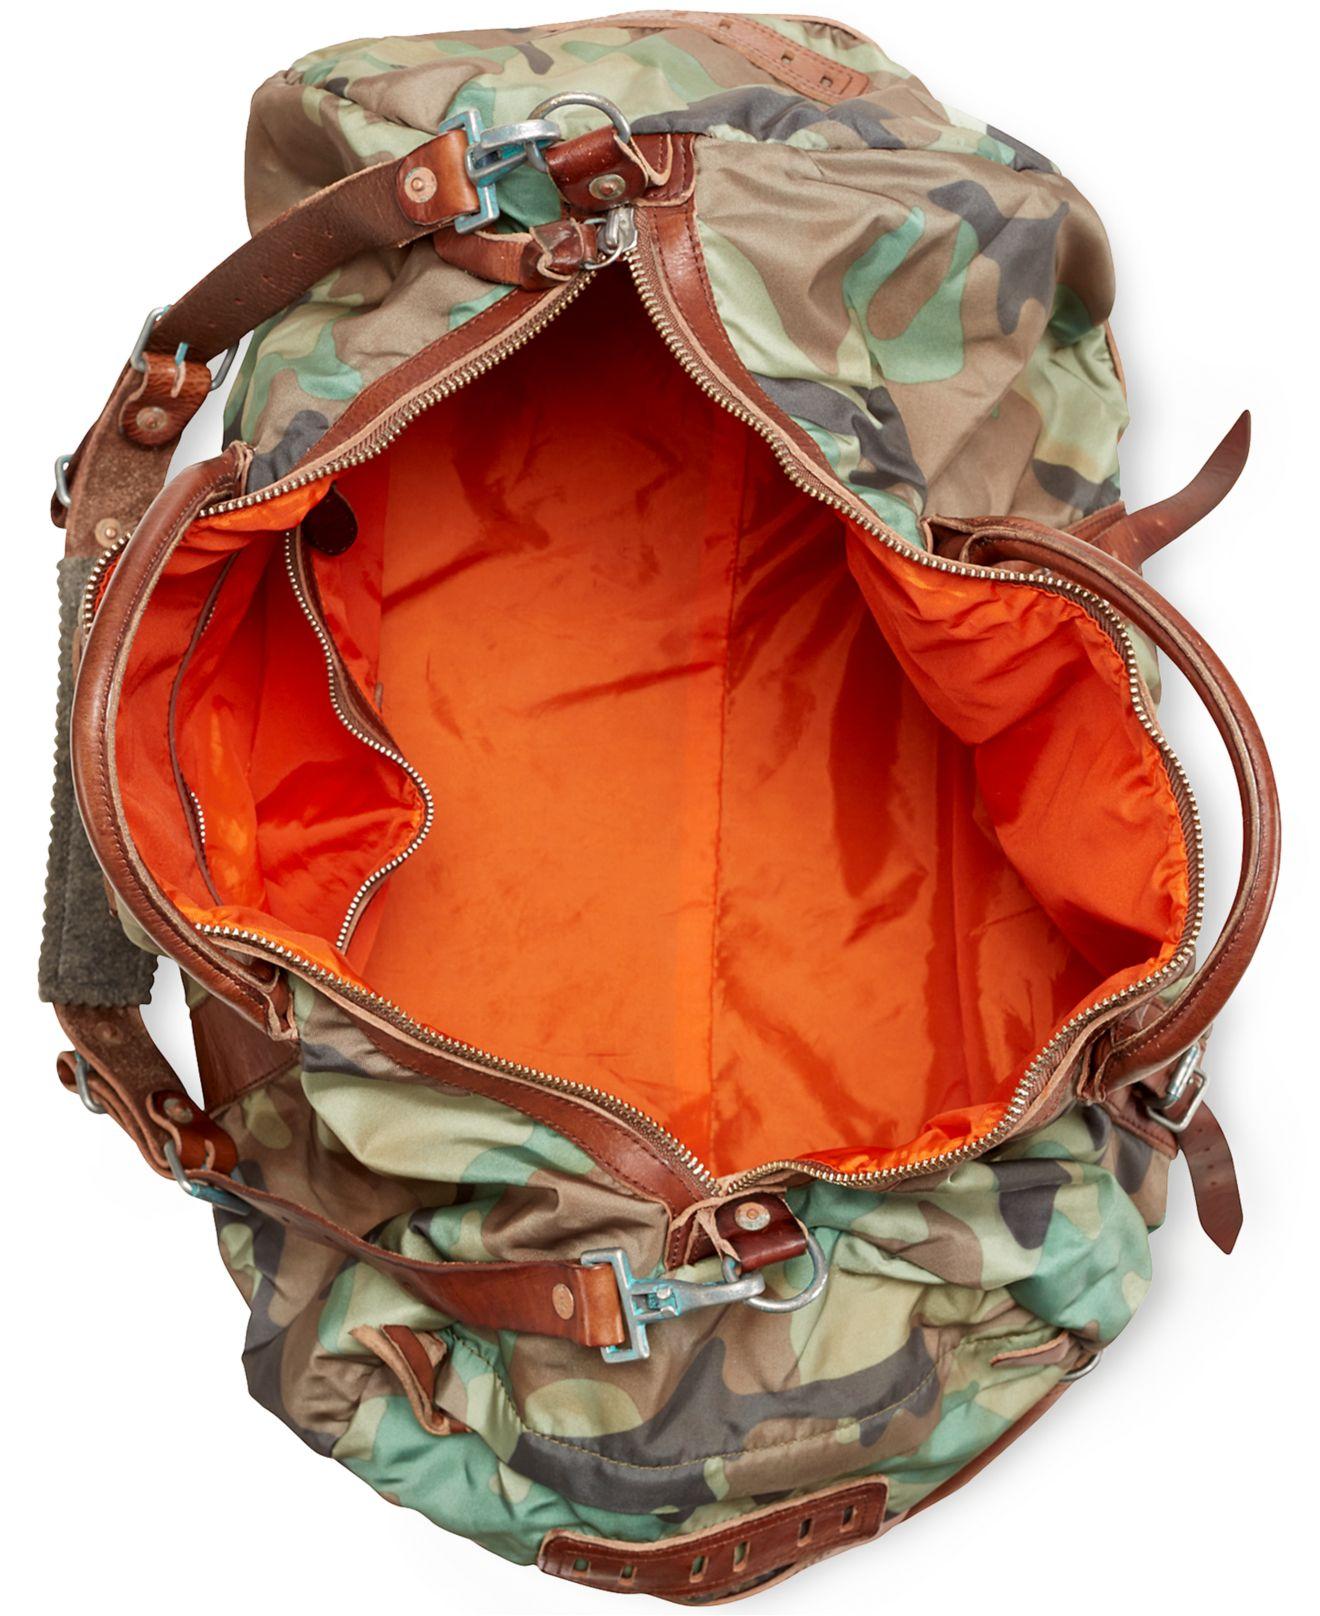 Lyst - Polo Ralph Lauren Yosemite Duffel Bag in Green for Men f2e23be53e